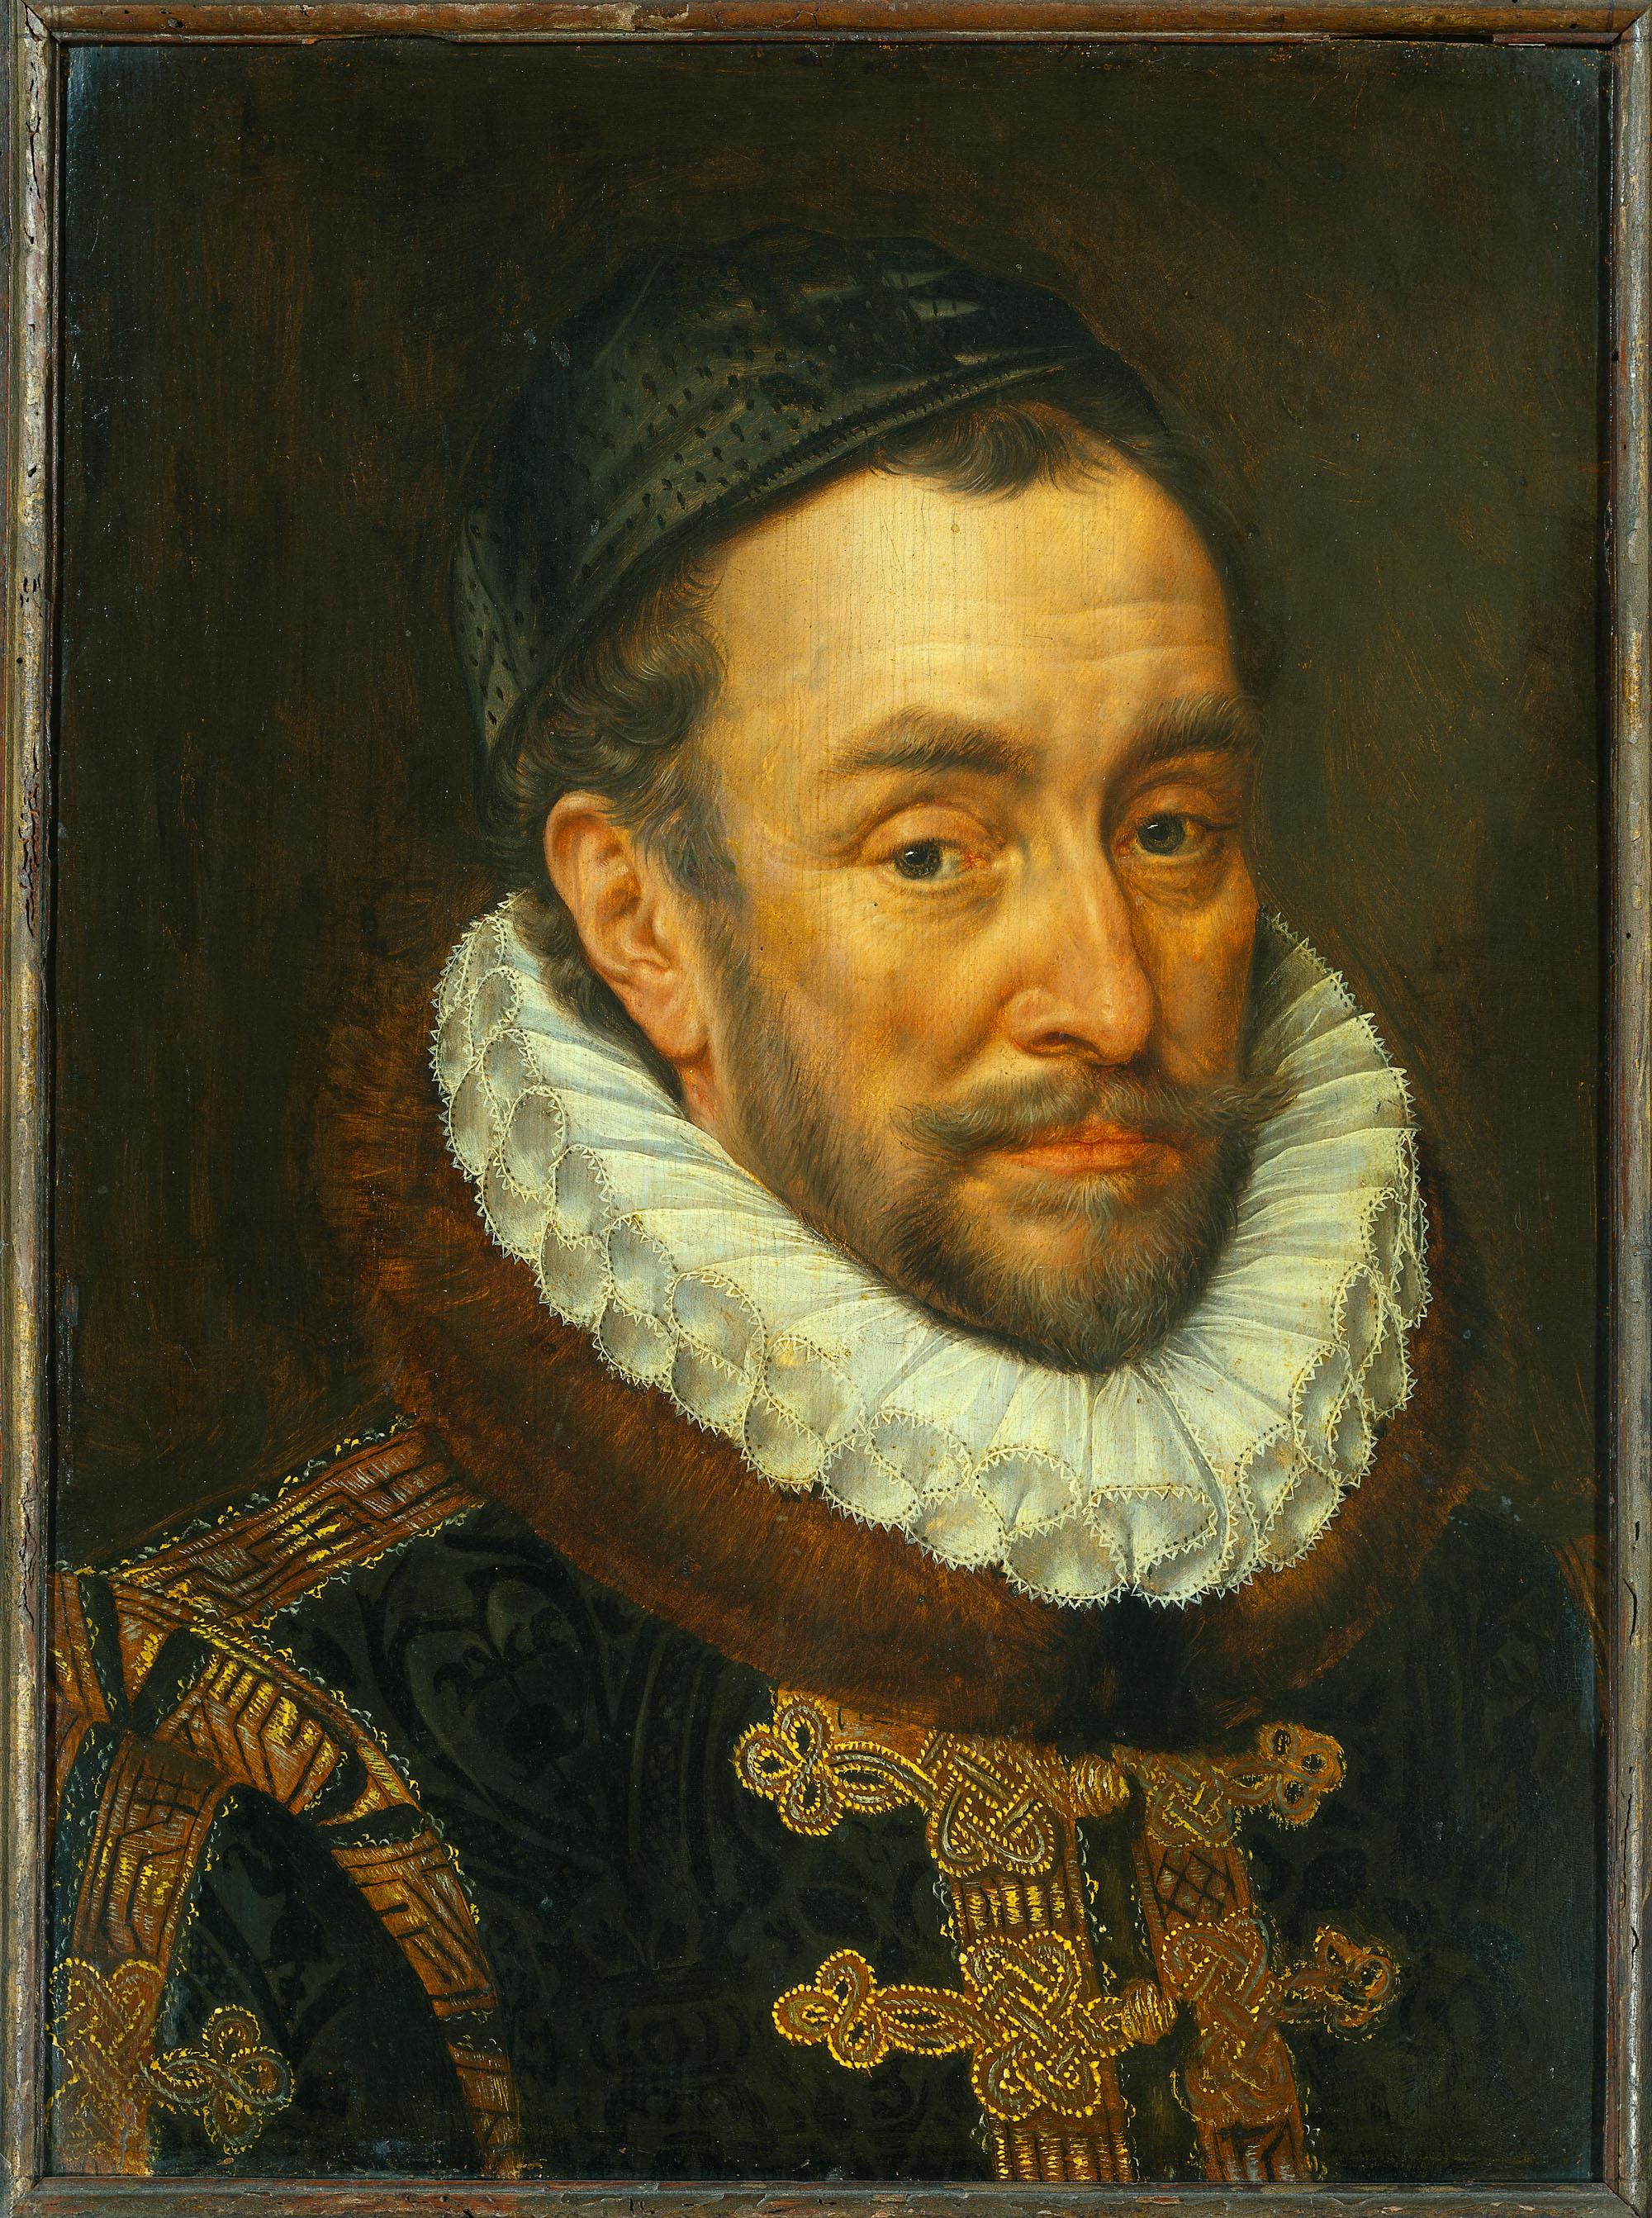 Adriaen Thomasz: Orániai Vilmos, 1579. Rijksmuseum, SK-A-3148